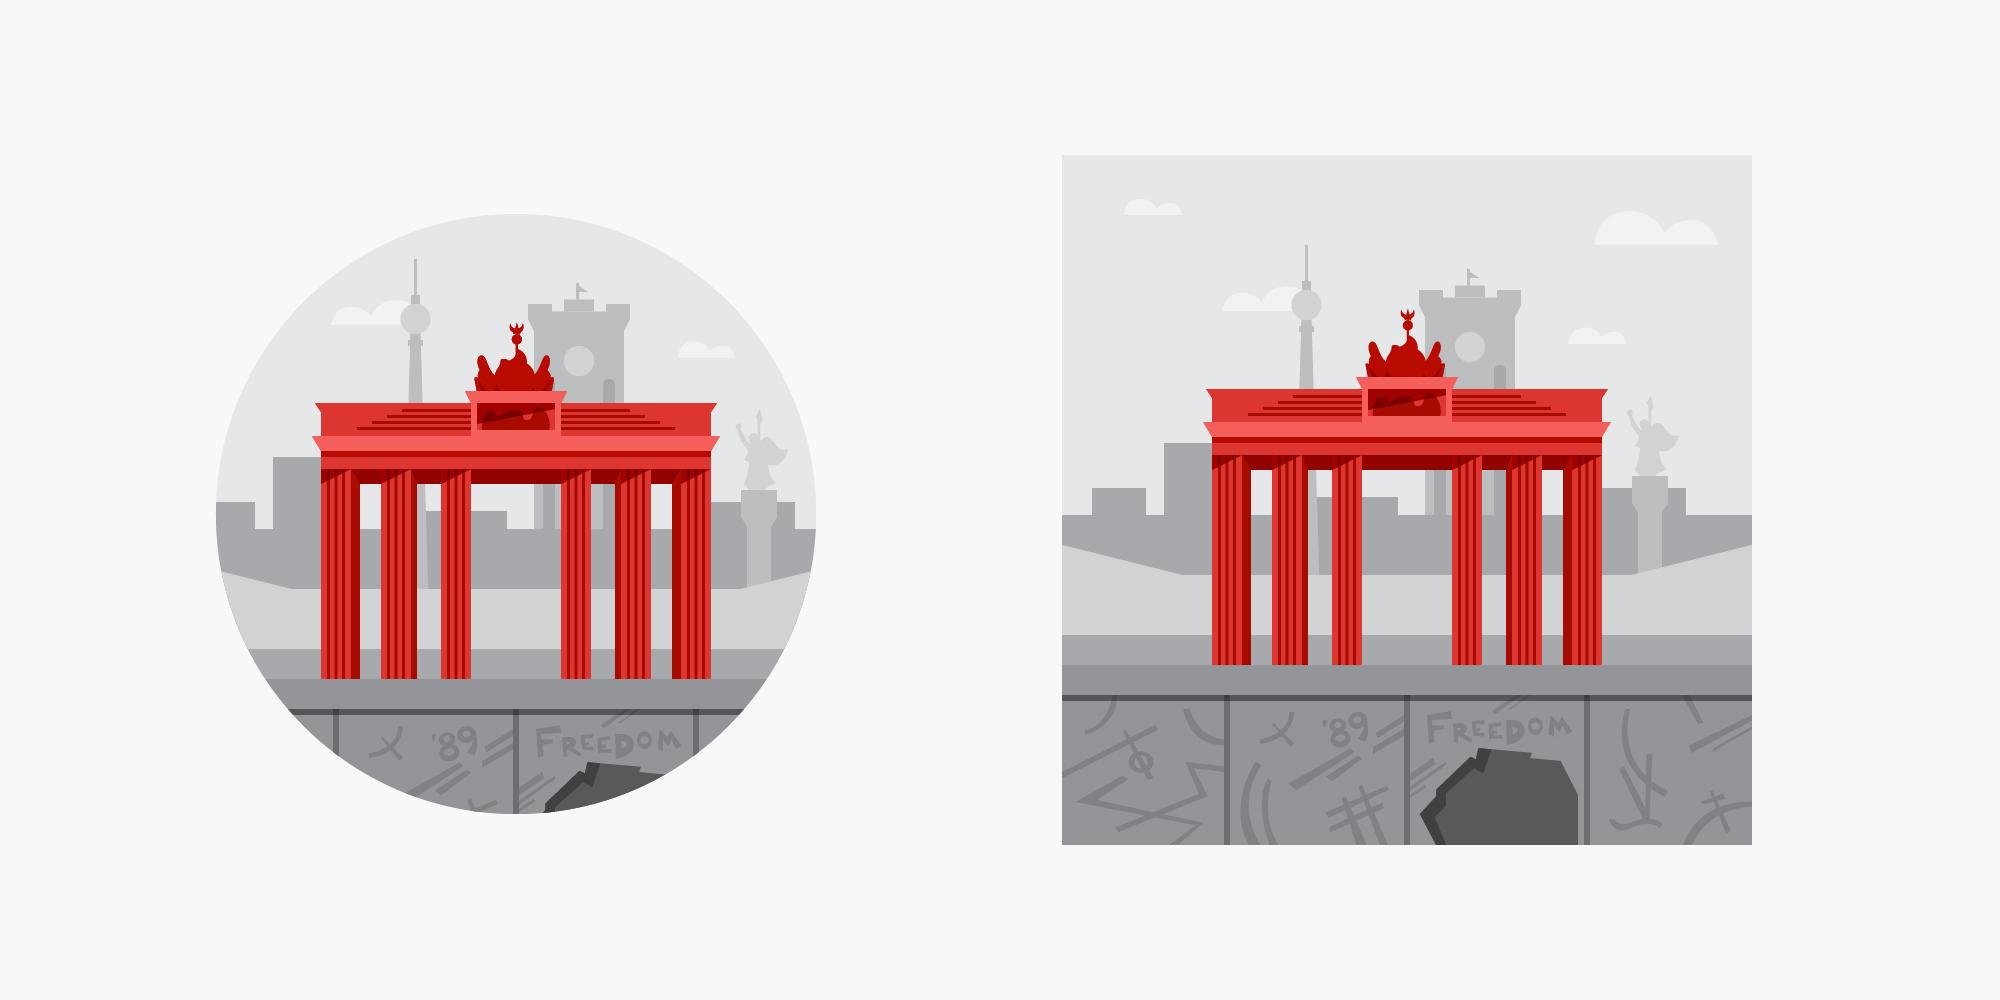 youtube_spaces_berlin_icons.jpg